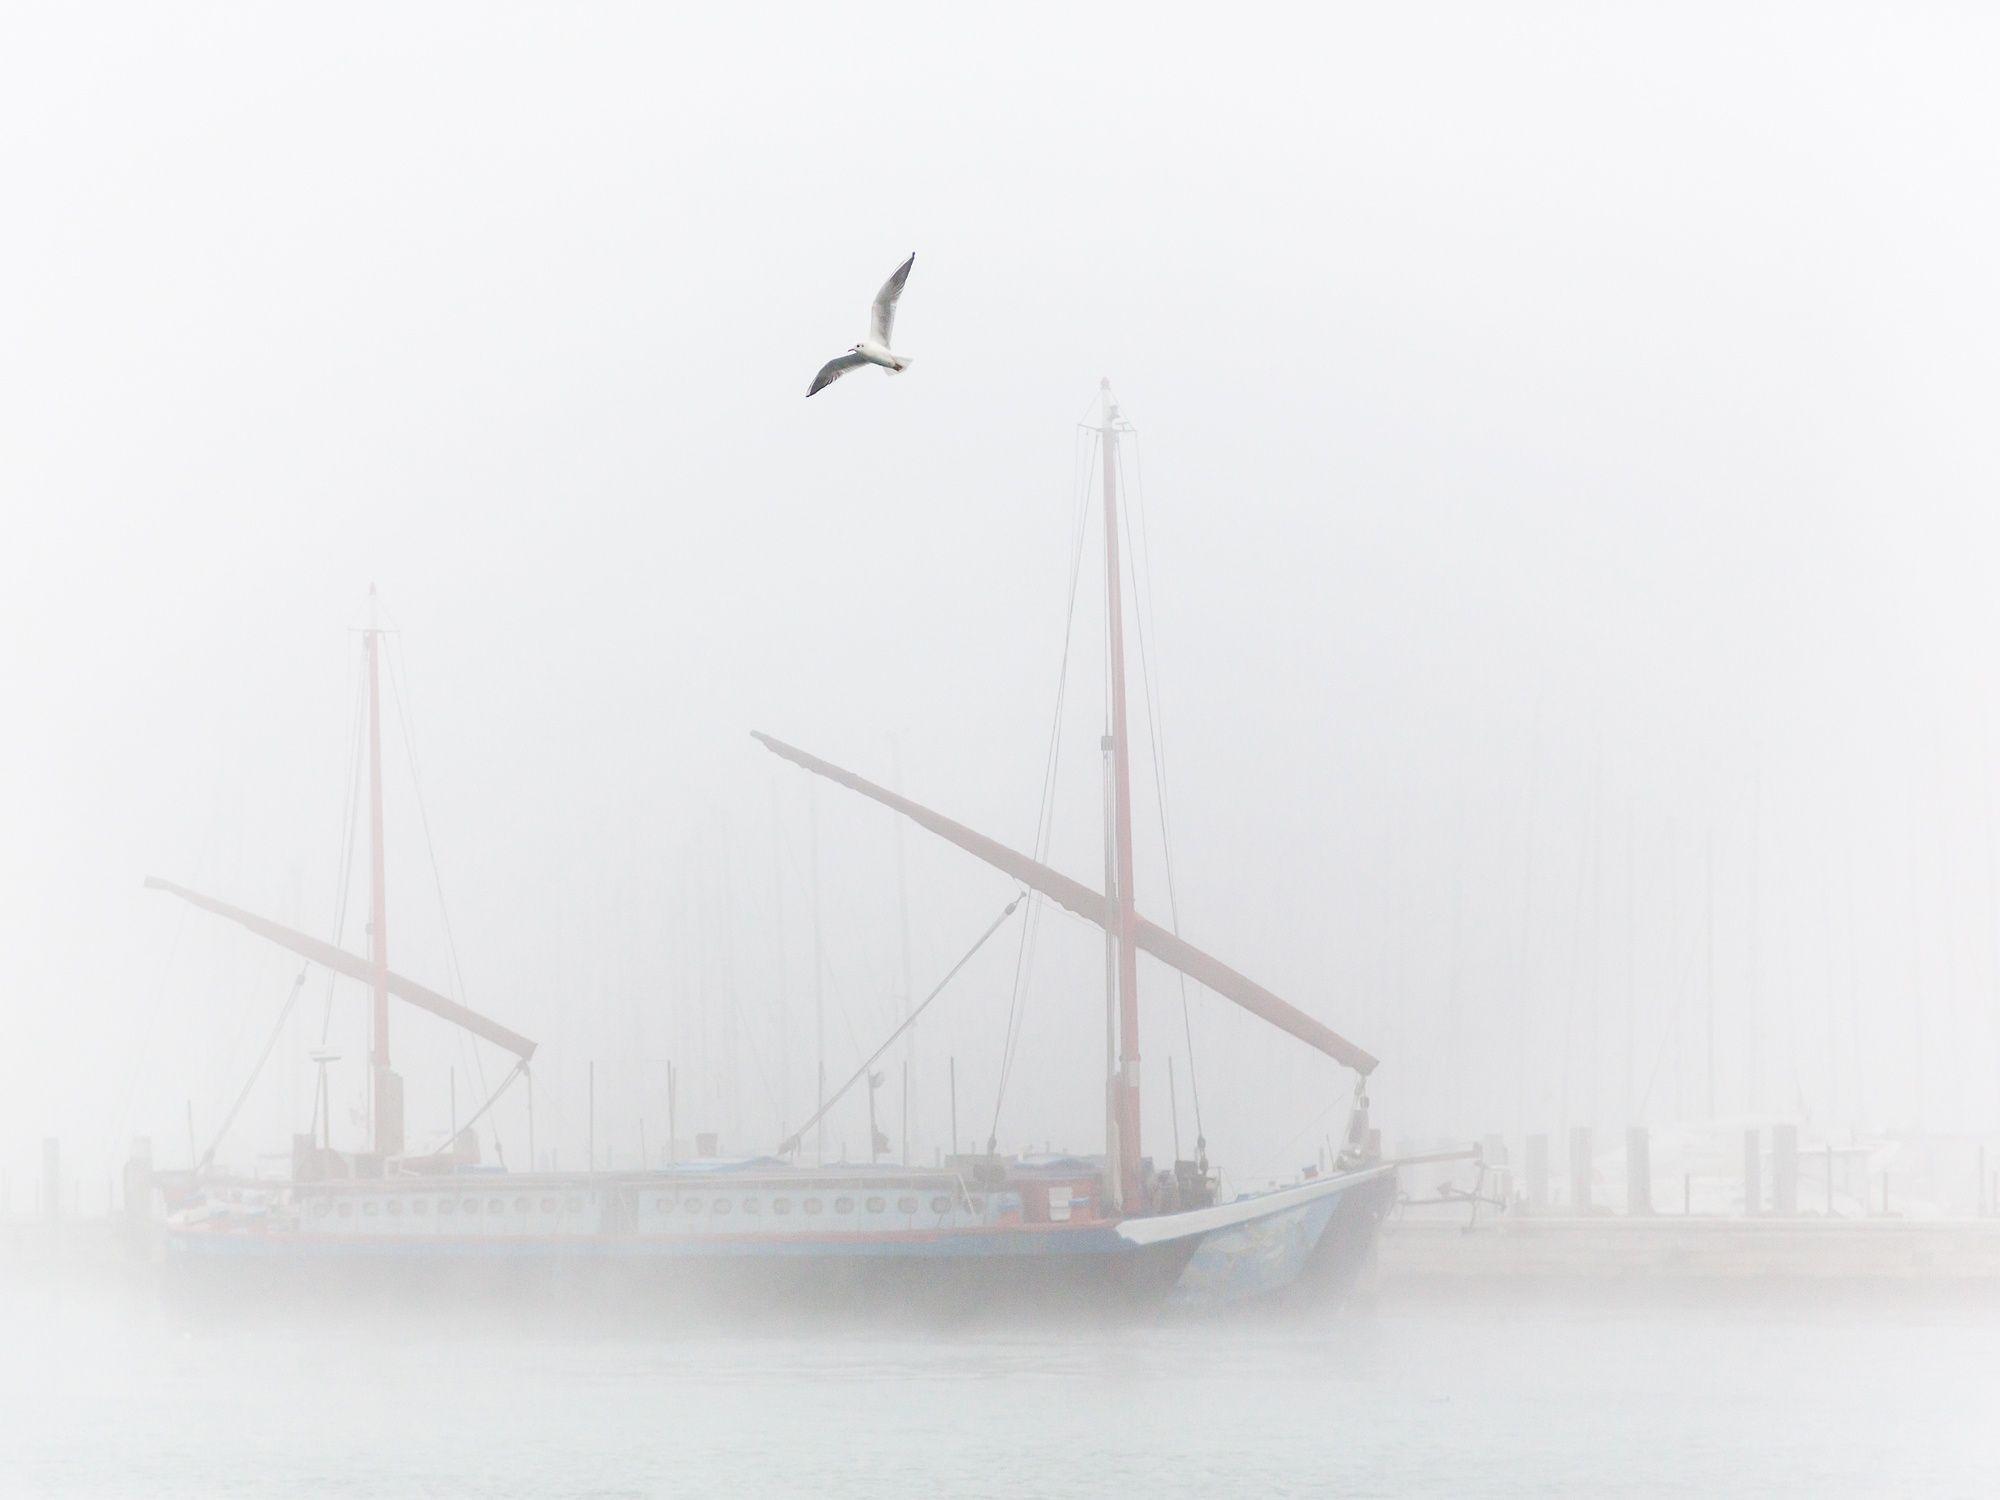 Urban Exploration: A bit of fog by lucagiuliani https://t.co/dWdLTu9QG8 | #500px #photography #photos https://t.co/3iBa3MaoMC #followme #photography